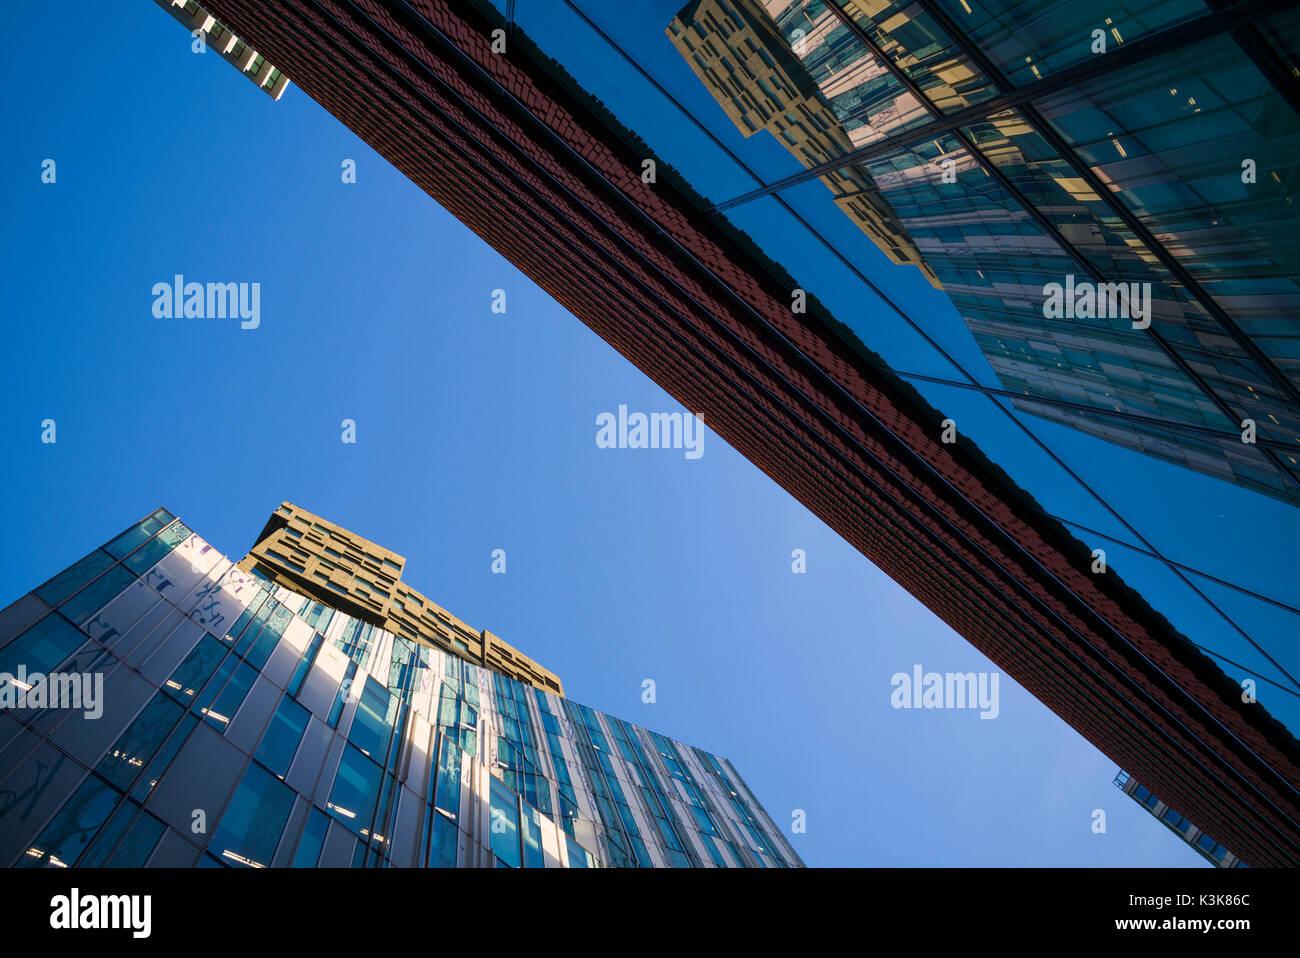 Netherlands, Amsterdam, Amstelveen area, office towers, dawn - Stock Image